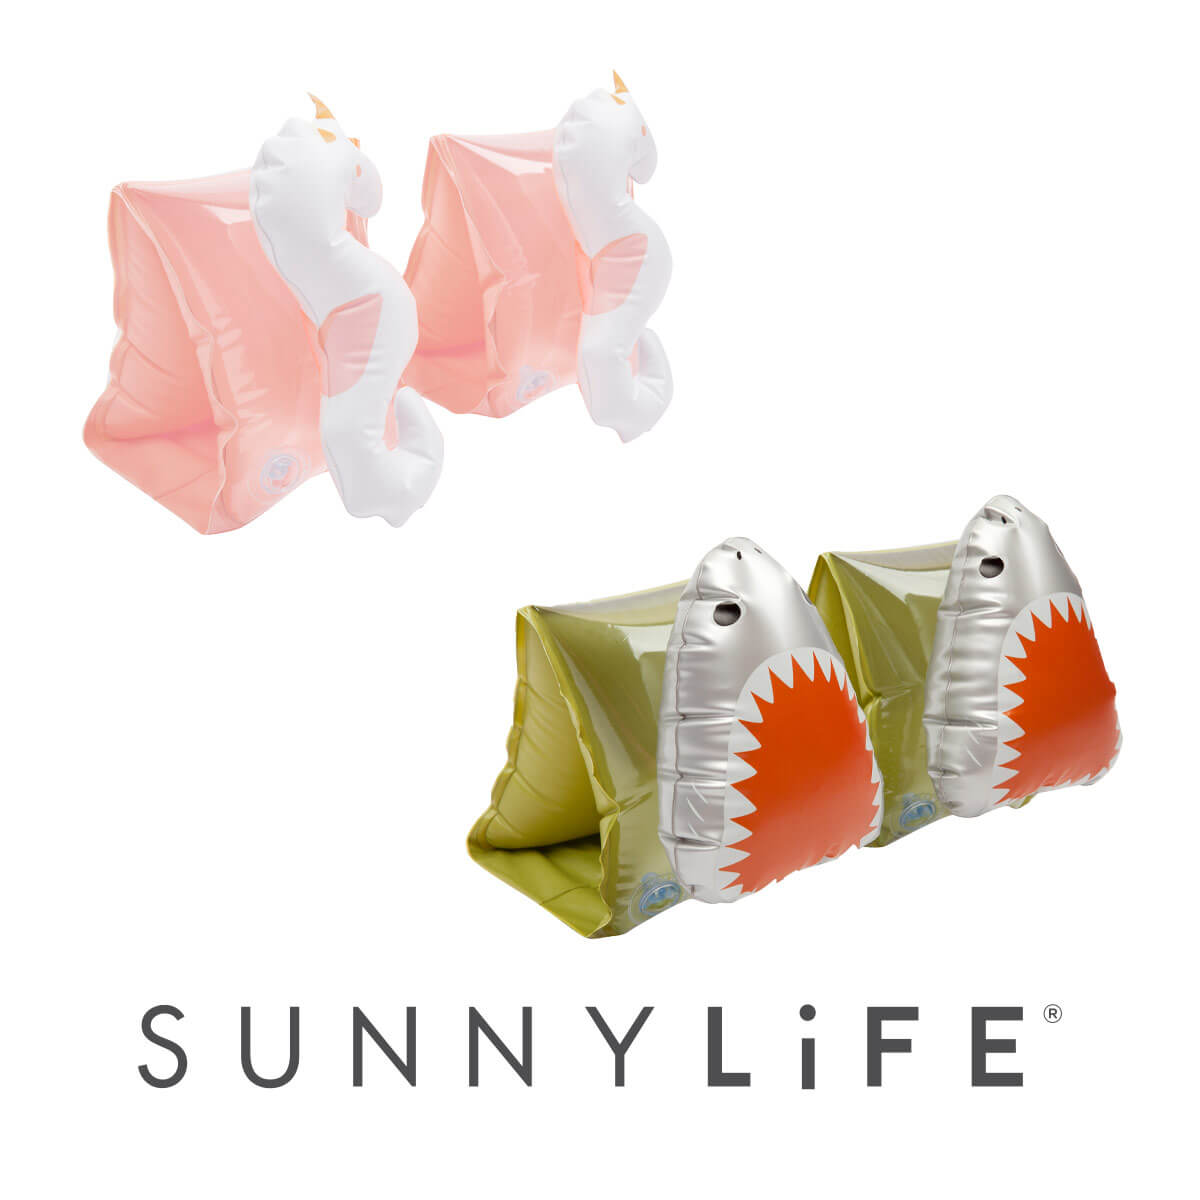 SUNNY LIFE キッズ アームリング 子供用 フロートバンド 腕浮き輪 プール 在庫限り 服 ビーチ 超目玉 アウトドア サニーライフ 持ち運び インスタ映え 海水浴 マリンスポーツ 海外品